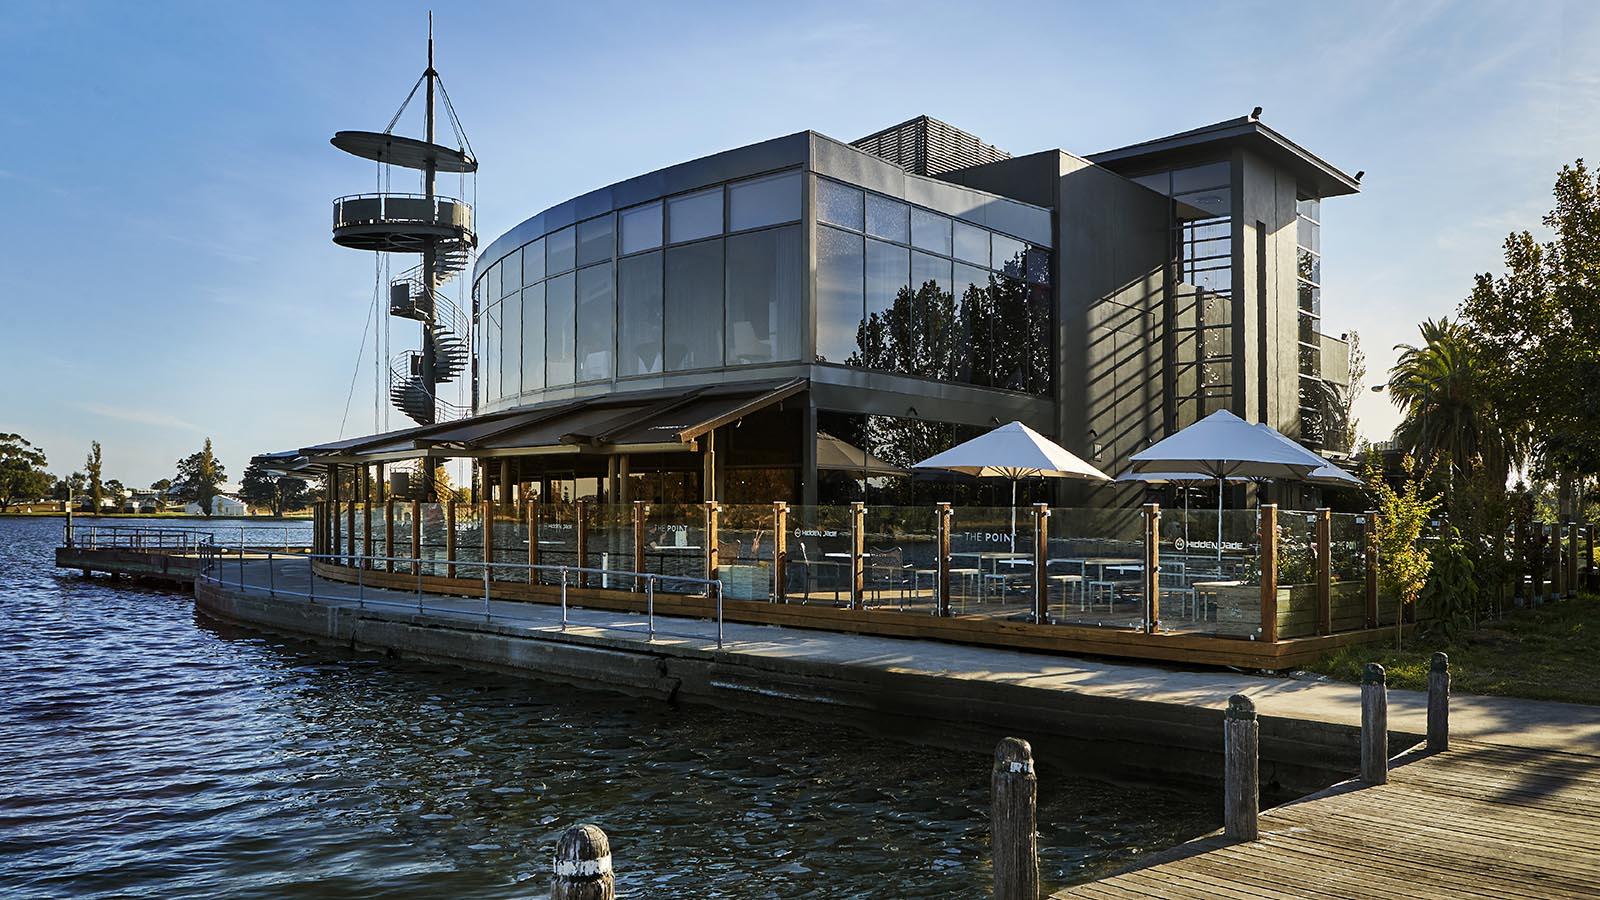 The Point, Melbourne, Victoria, Australia